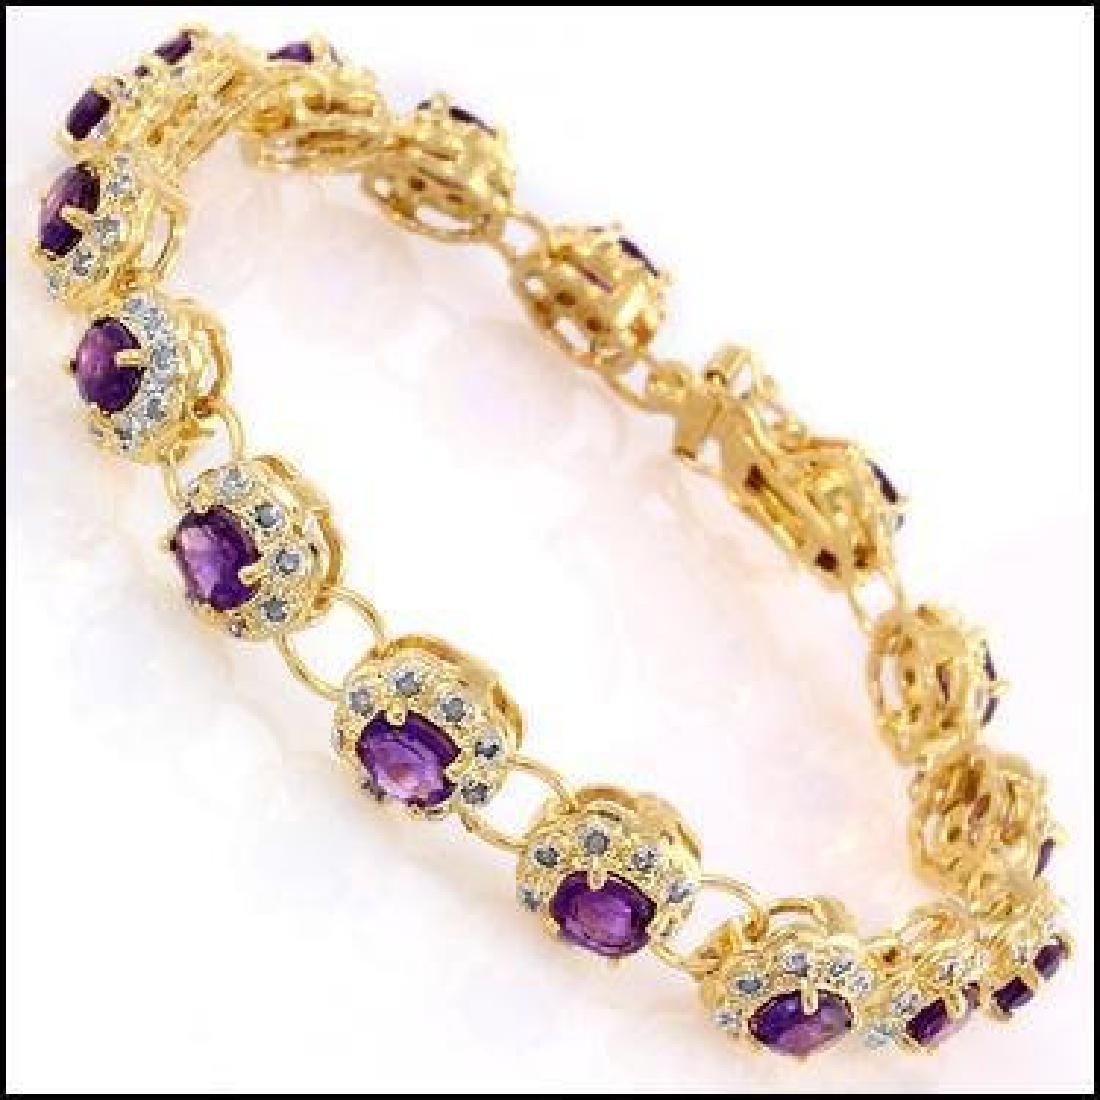 15.55 Ct Amethyst & Diamond Designer Bracelet $1,390